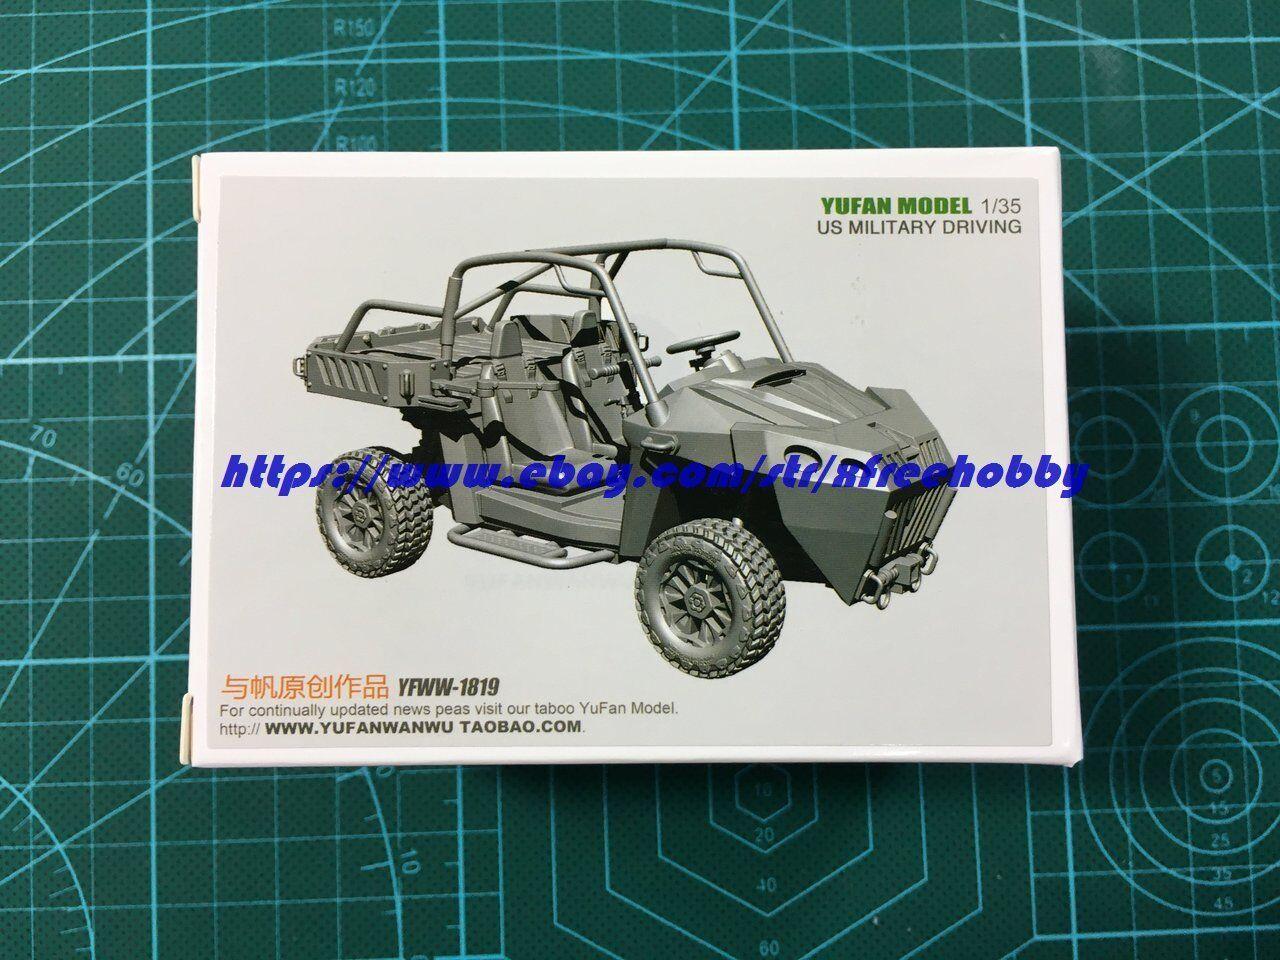 YUFAN 1819 1 35 U.S. Military Driving - All Terrain Vehicle (ATV)